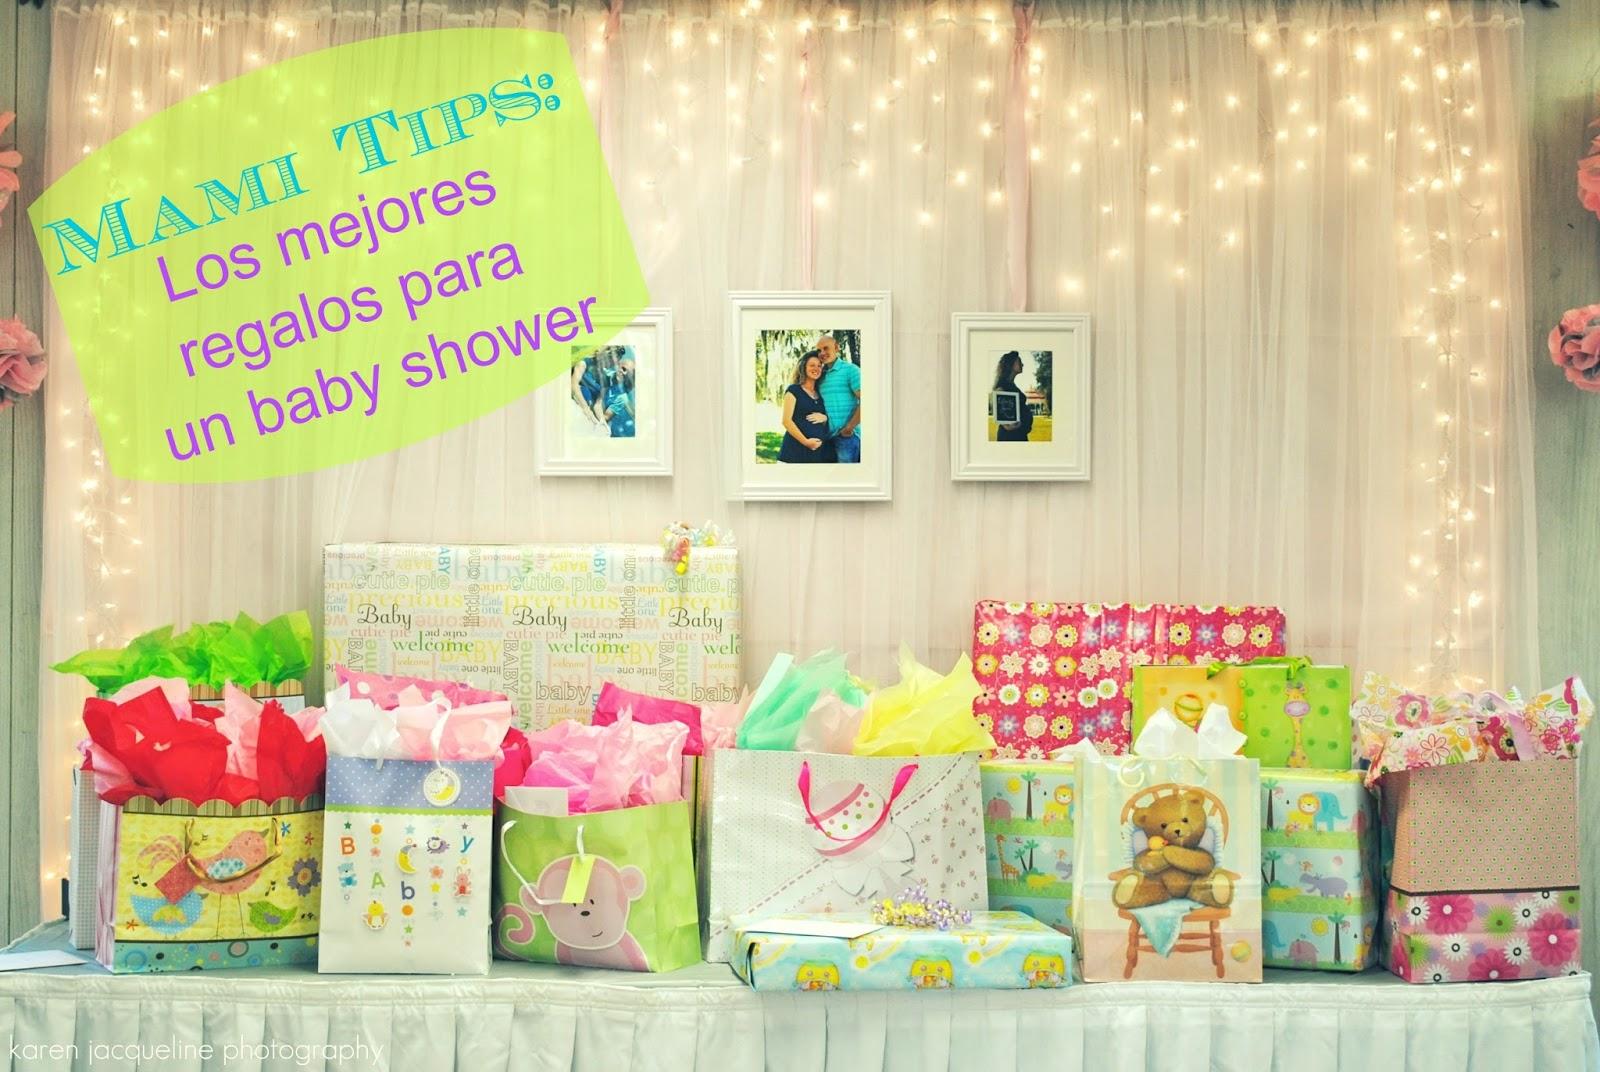 Mejores Regalos Baby Shower.Hey Mami Mami Tips Los Mejores Regalos Para Un Baby Shower